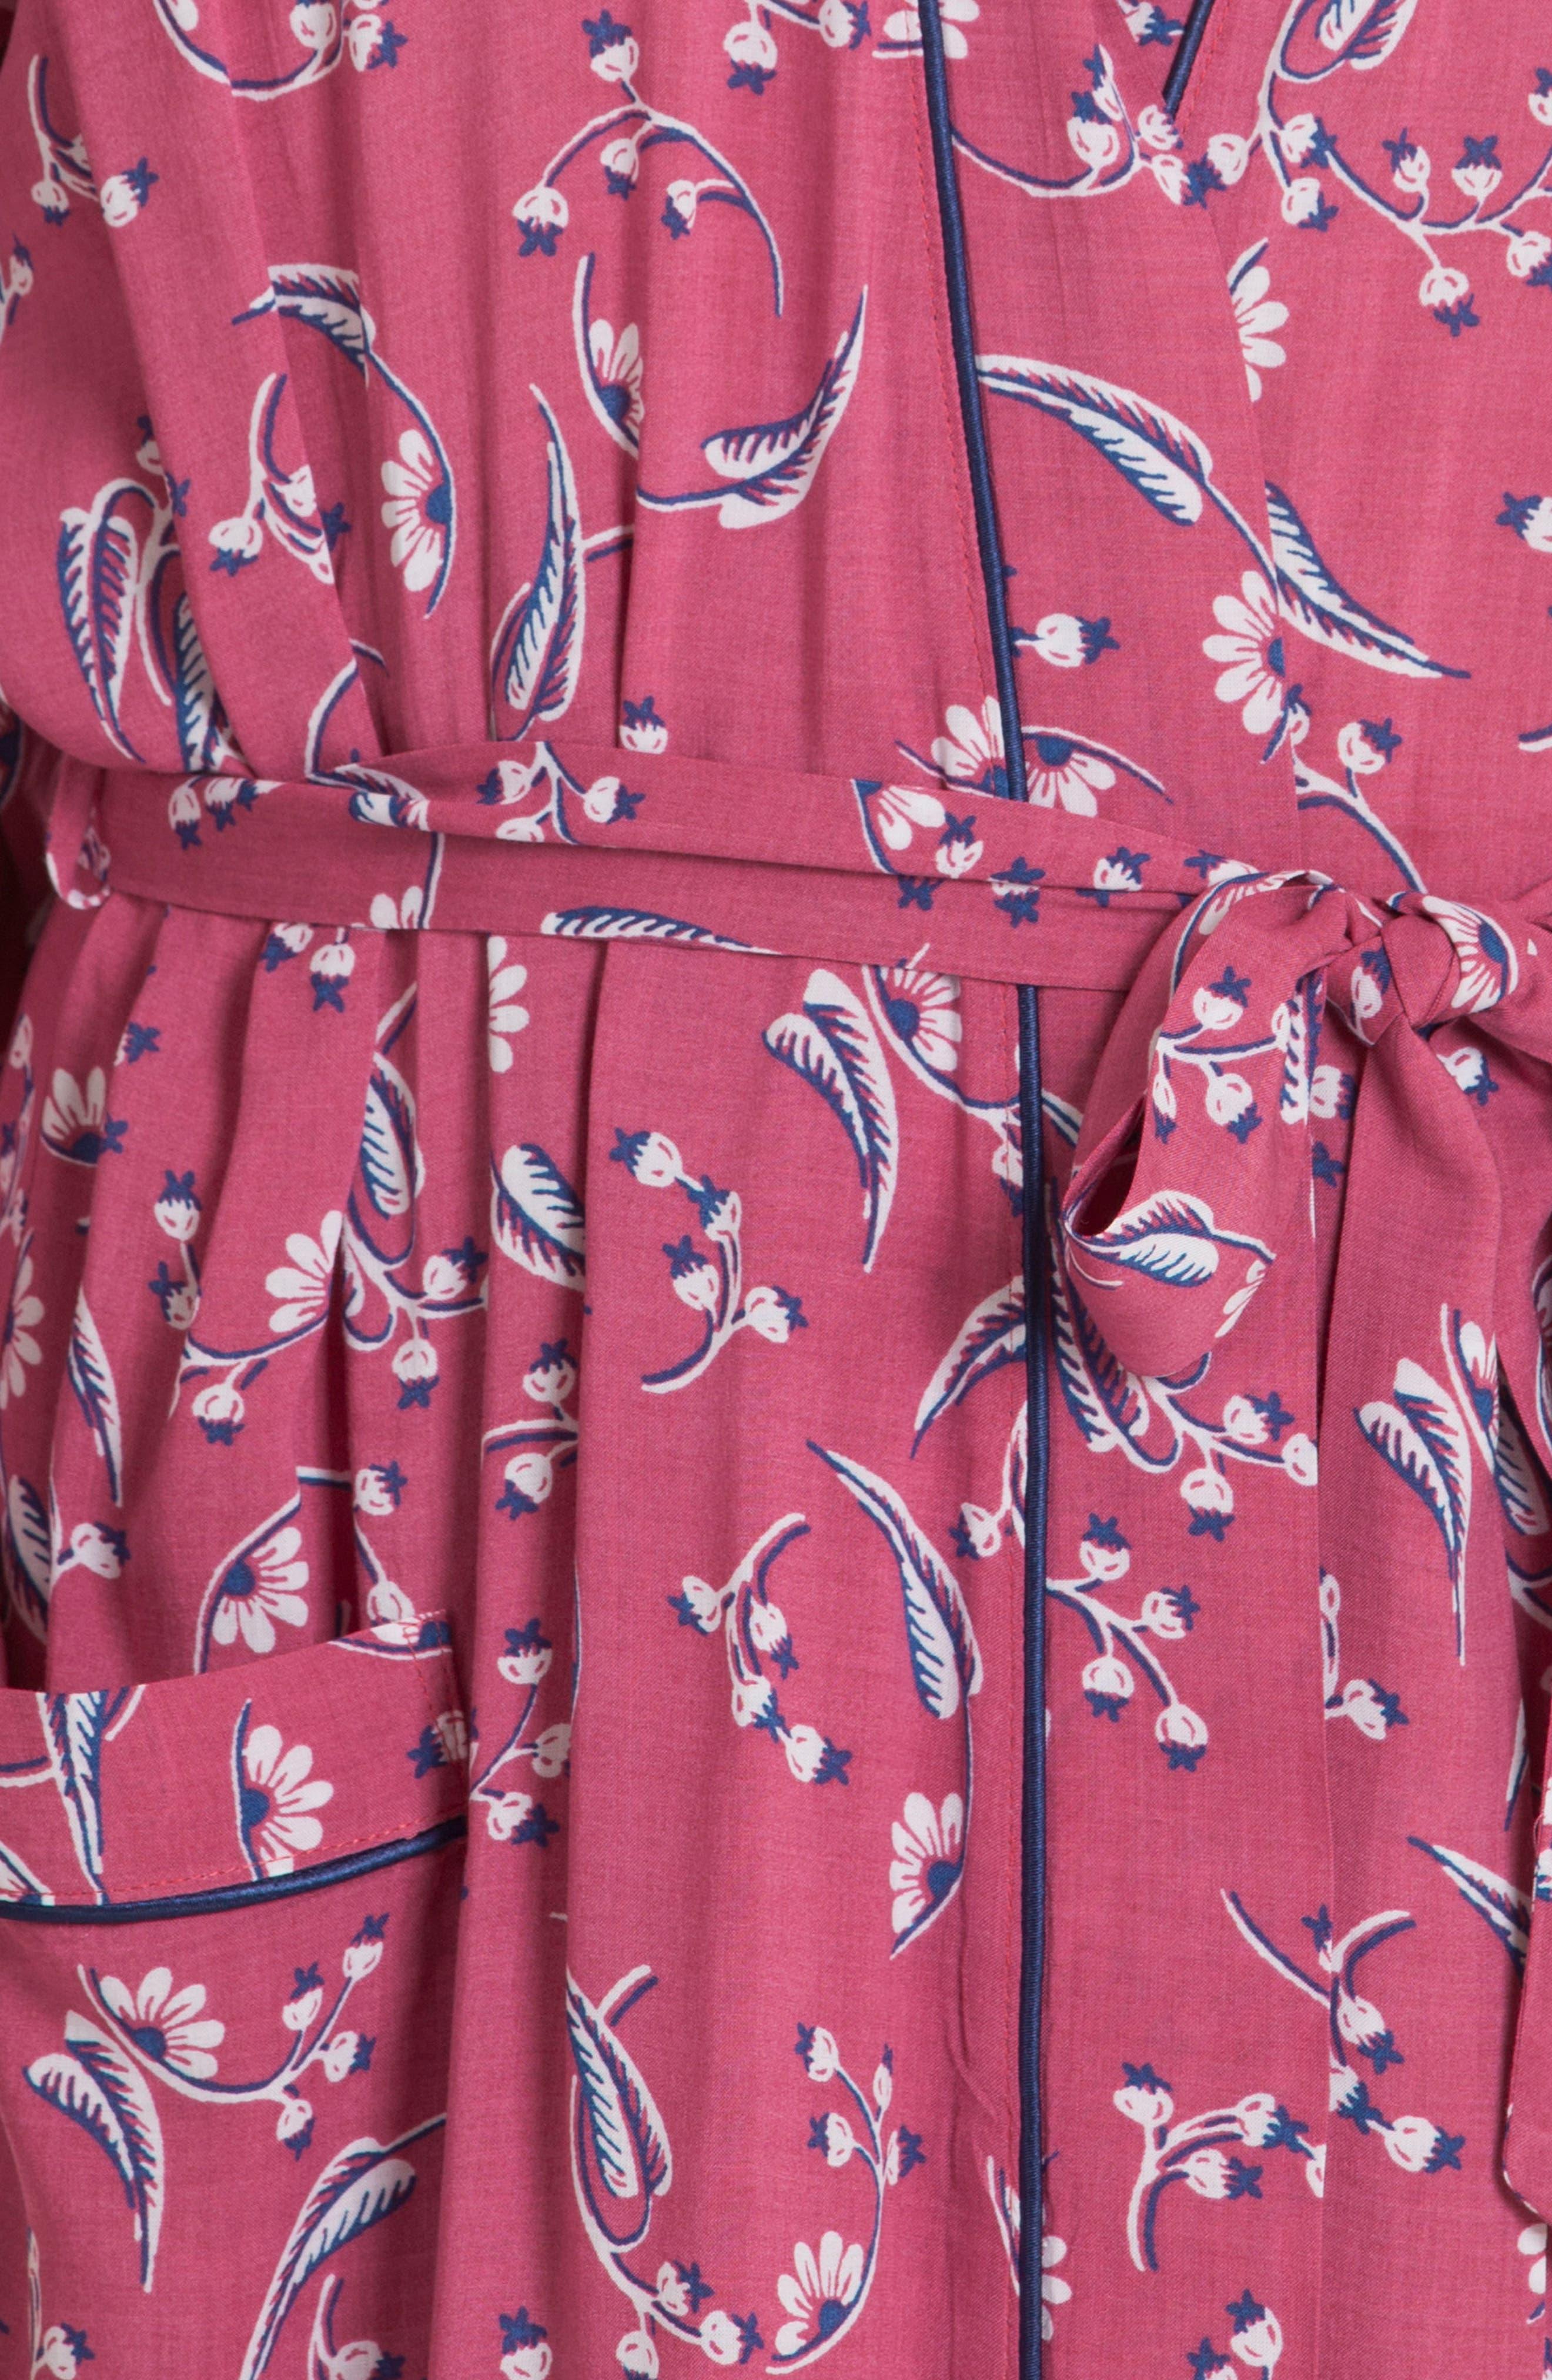 Short Robe,                             Alternate thumbnail 4, color,                             Cherry Print